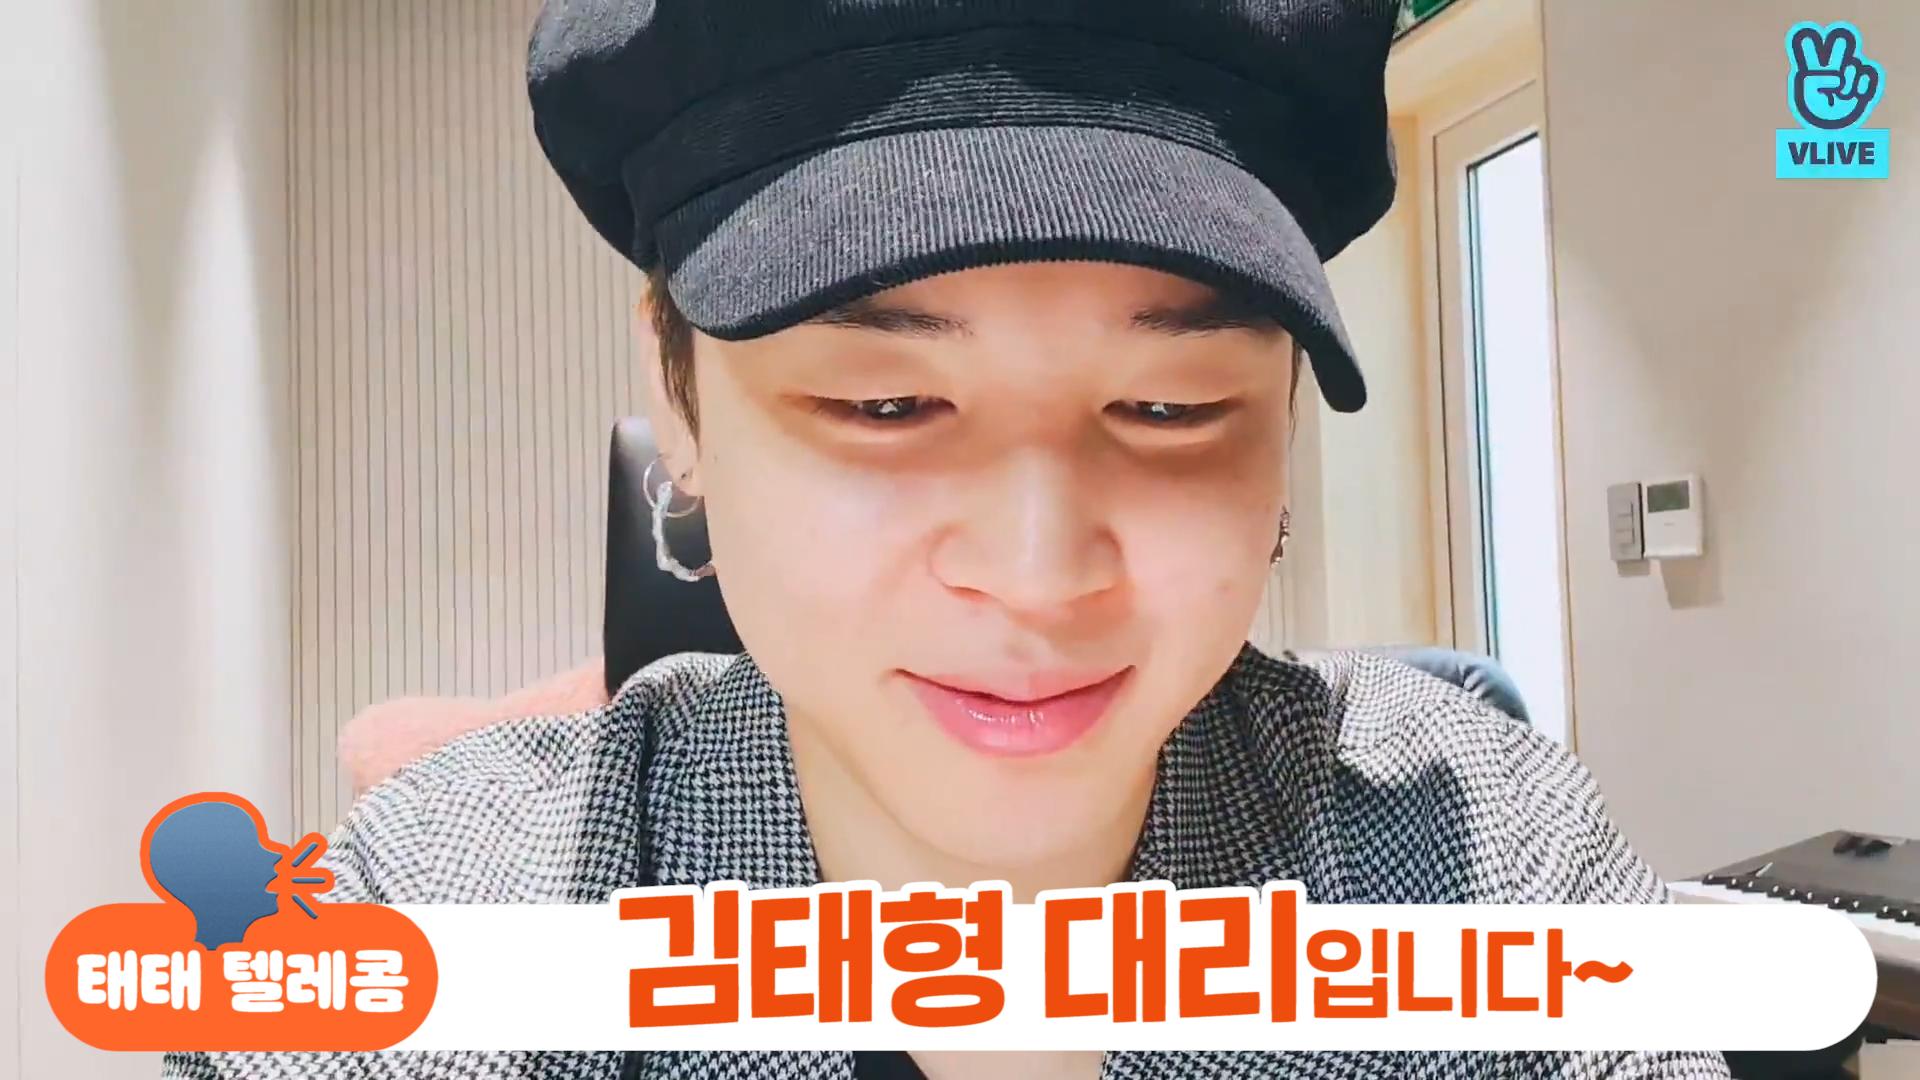 [BTS] 이런 깜찍 보이스뷔싱이라면 9조8억번 낚여도 좋아.. 헬로 아임 피쉬..📞🐟 (JIMIN calling with JIN&V)